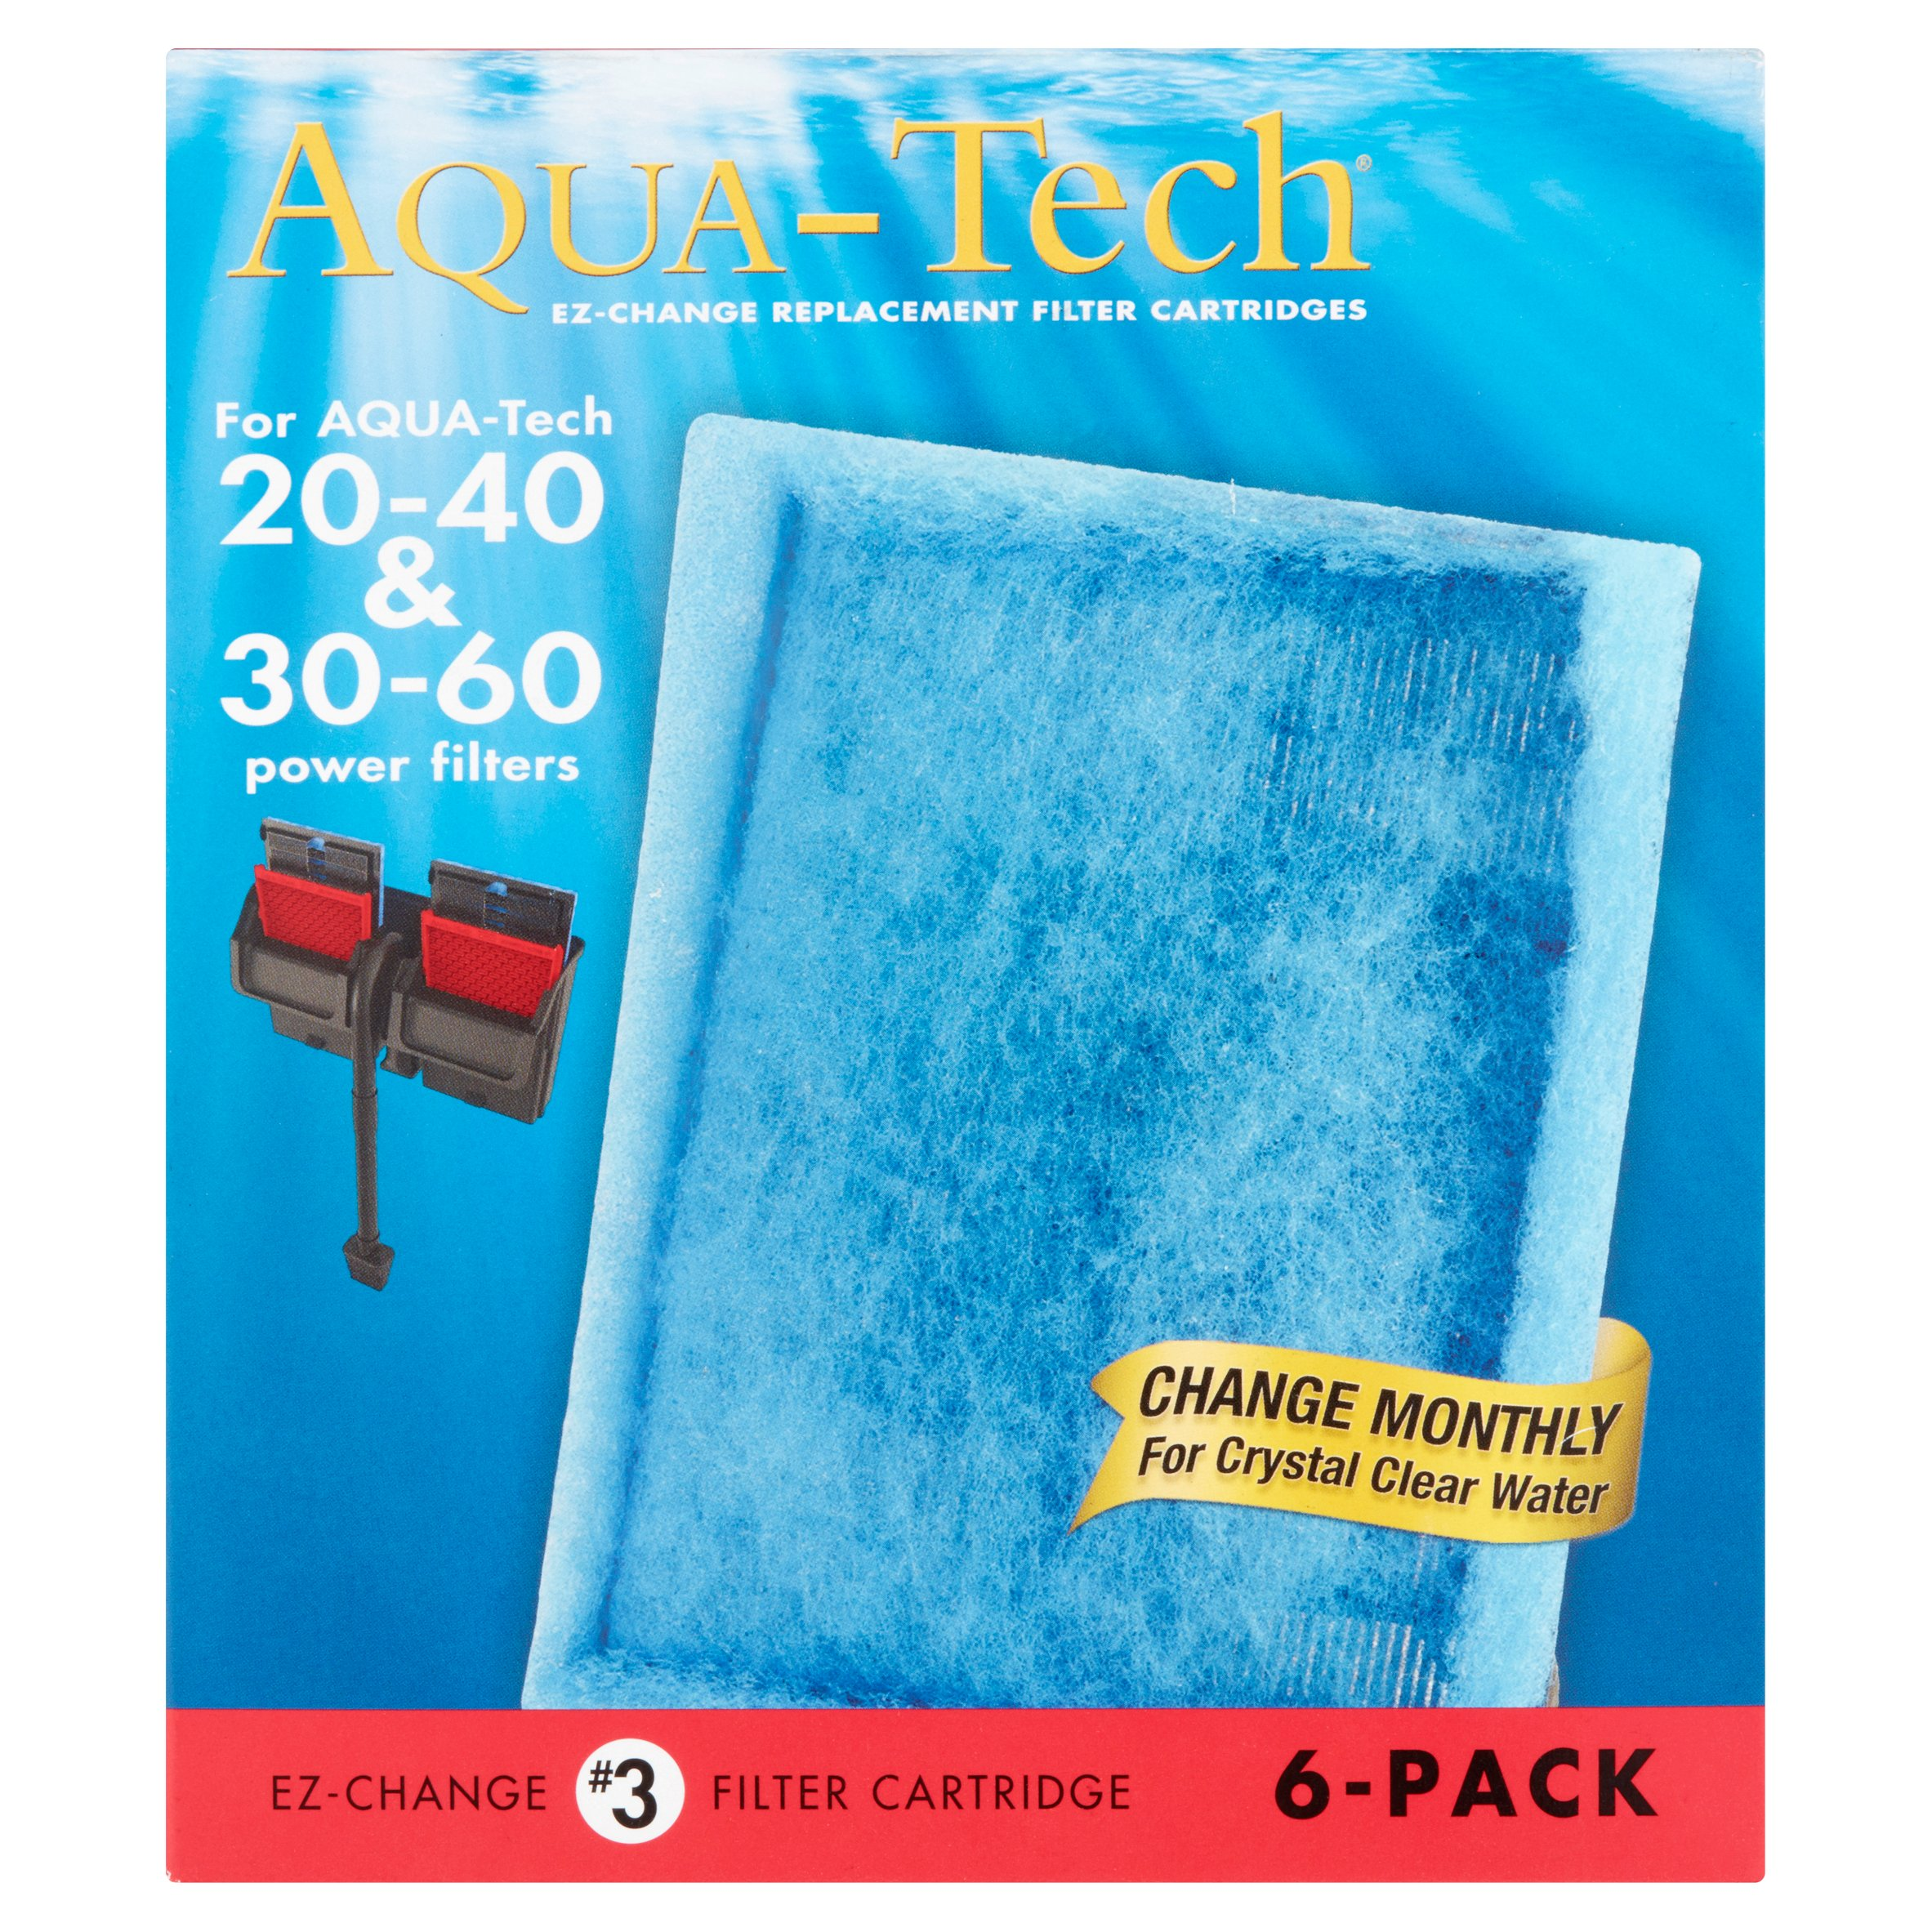 Aqua-Tech EZ-Change Replacement #3 Aquarium Filter Cartridge, 6 pack